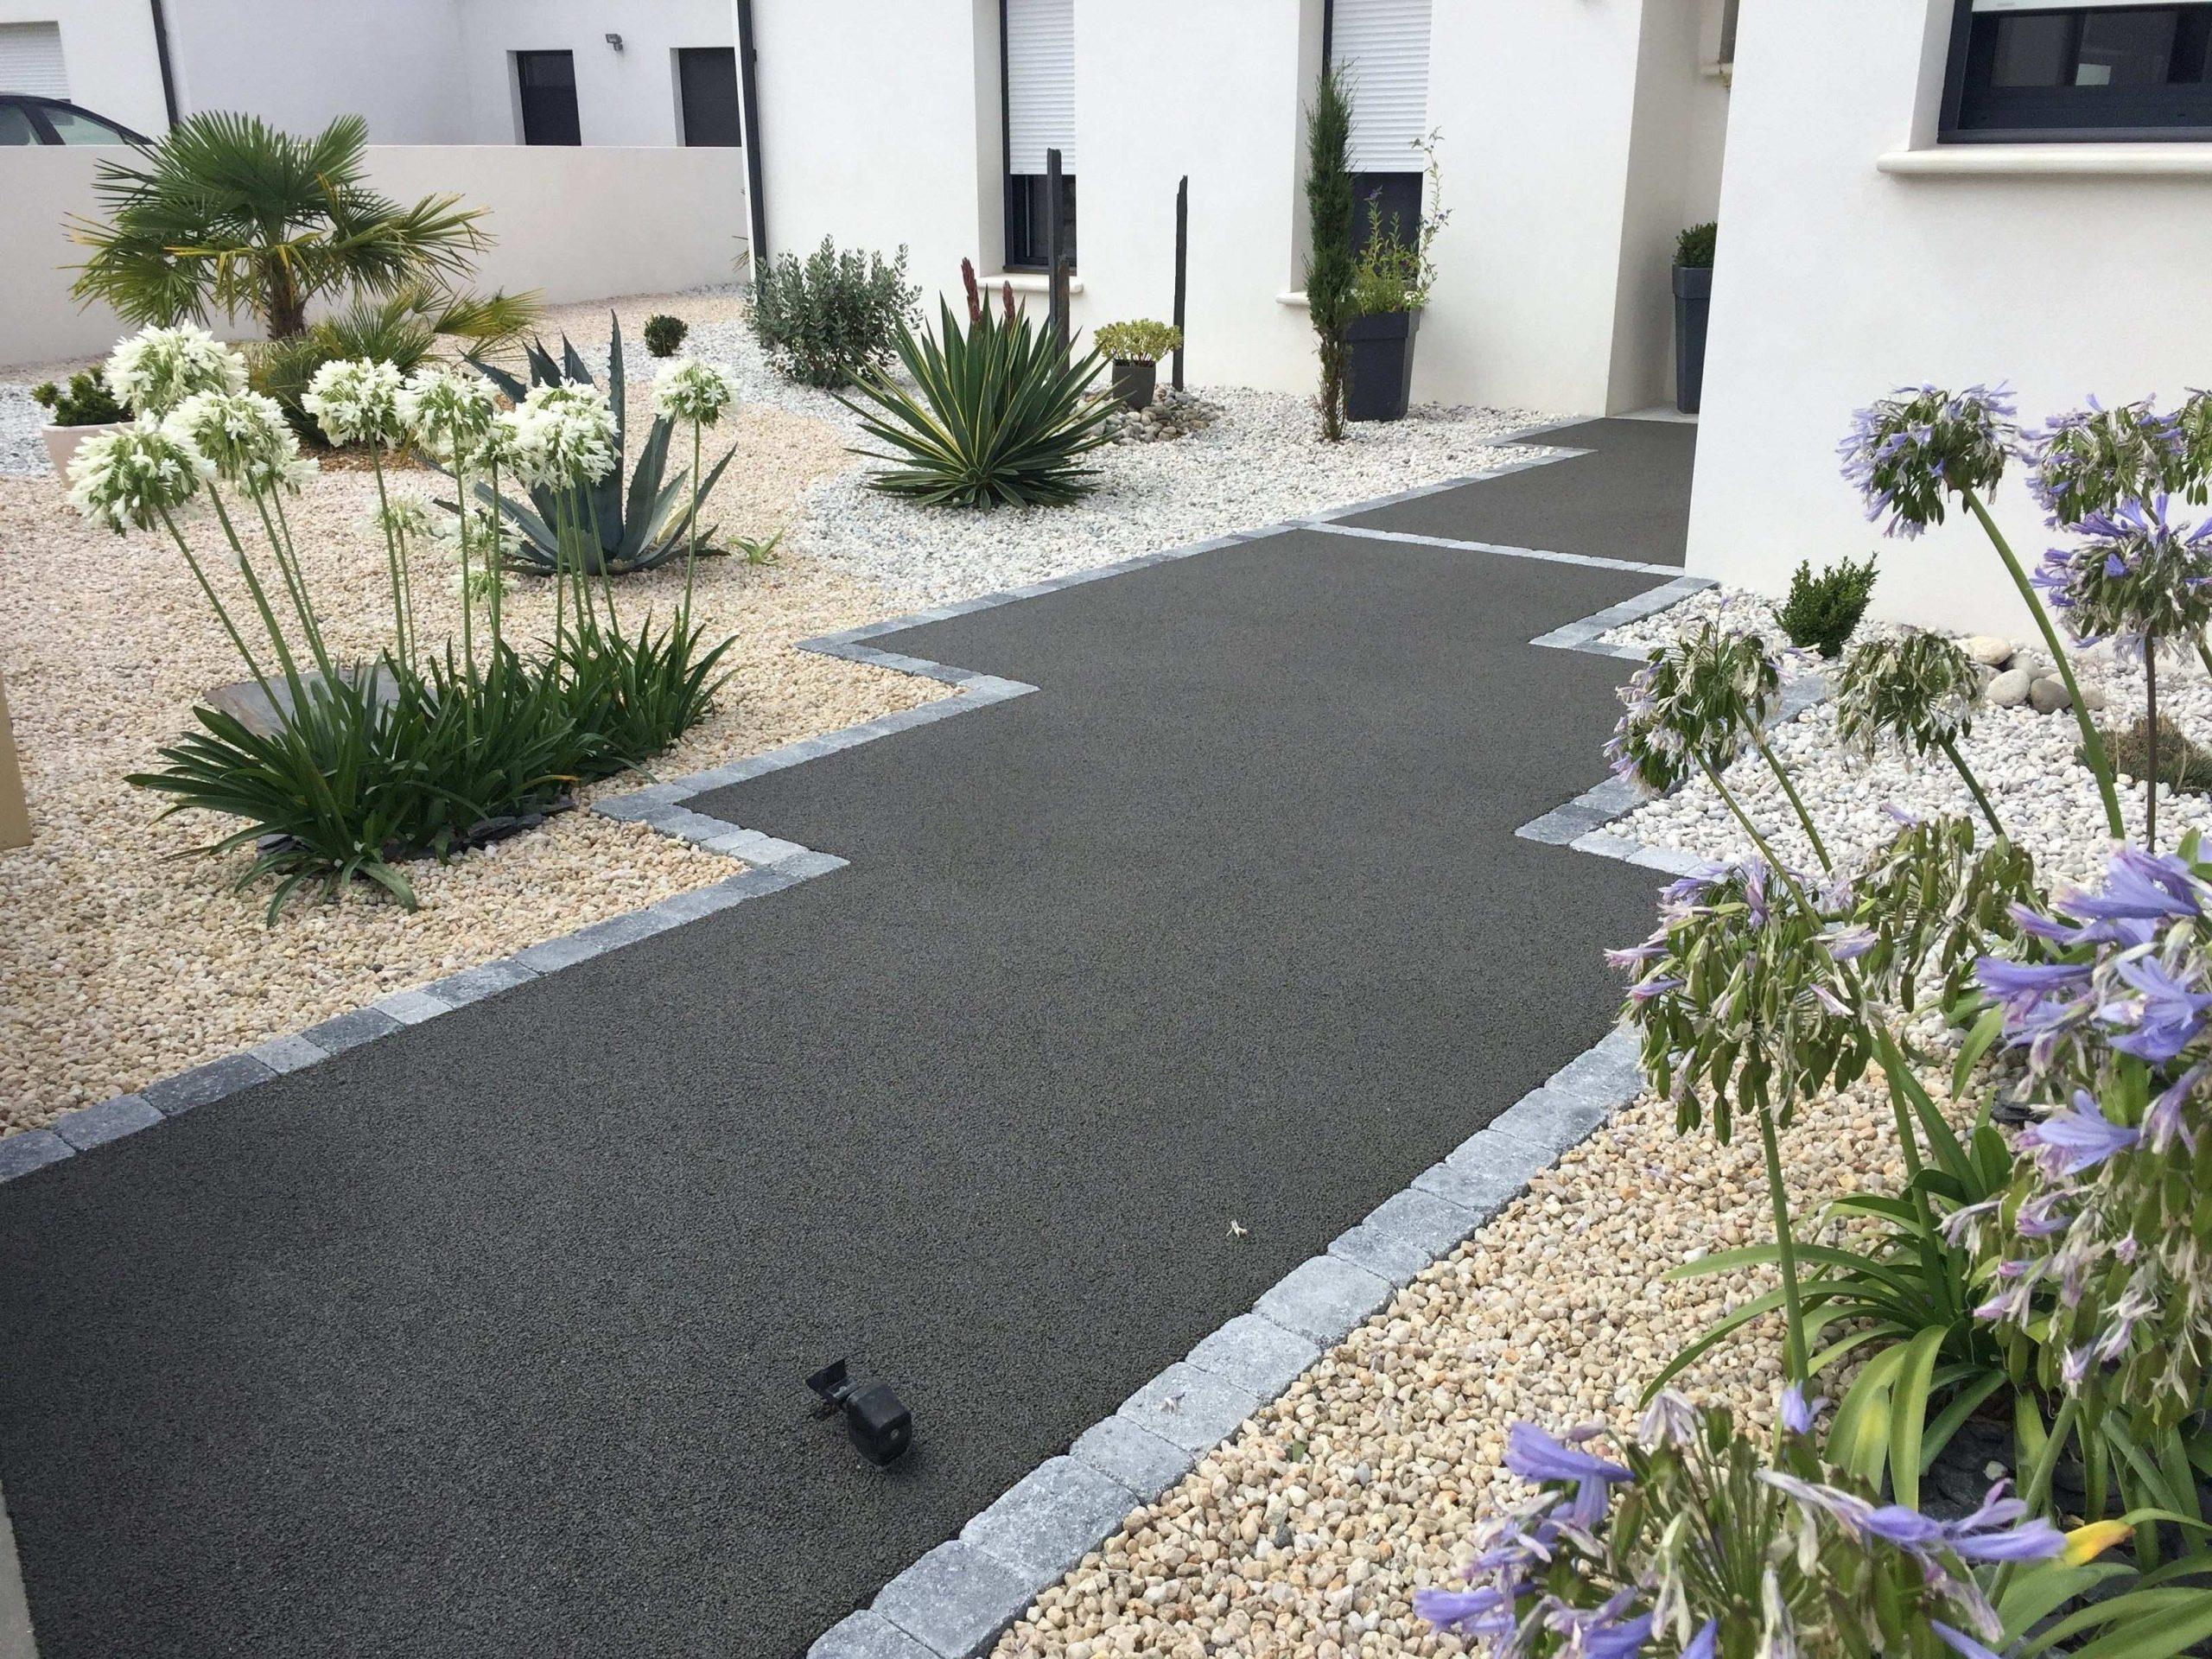 Inspirational Revetement Allée De Garage Pas Cher | Jardin ... dedans Allée De Jardin Pas Cher